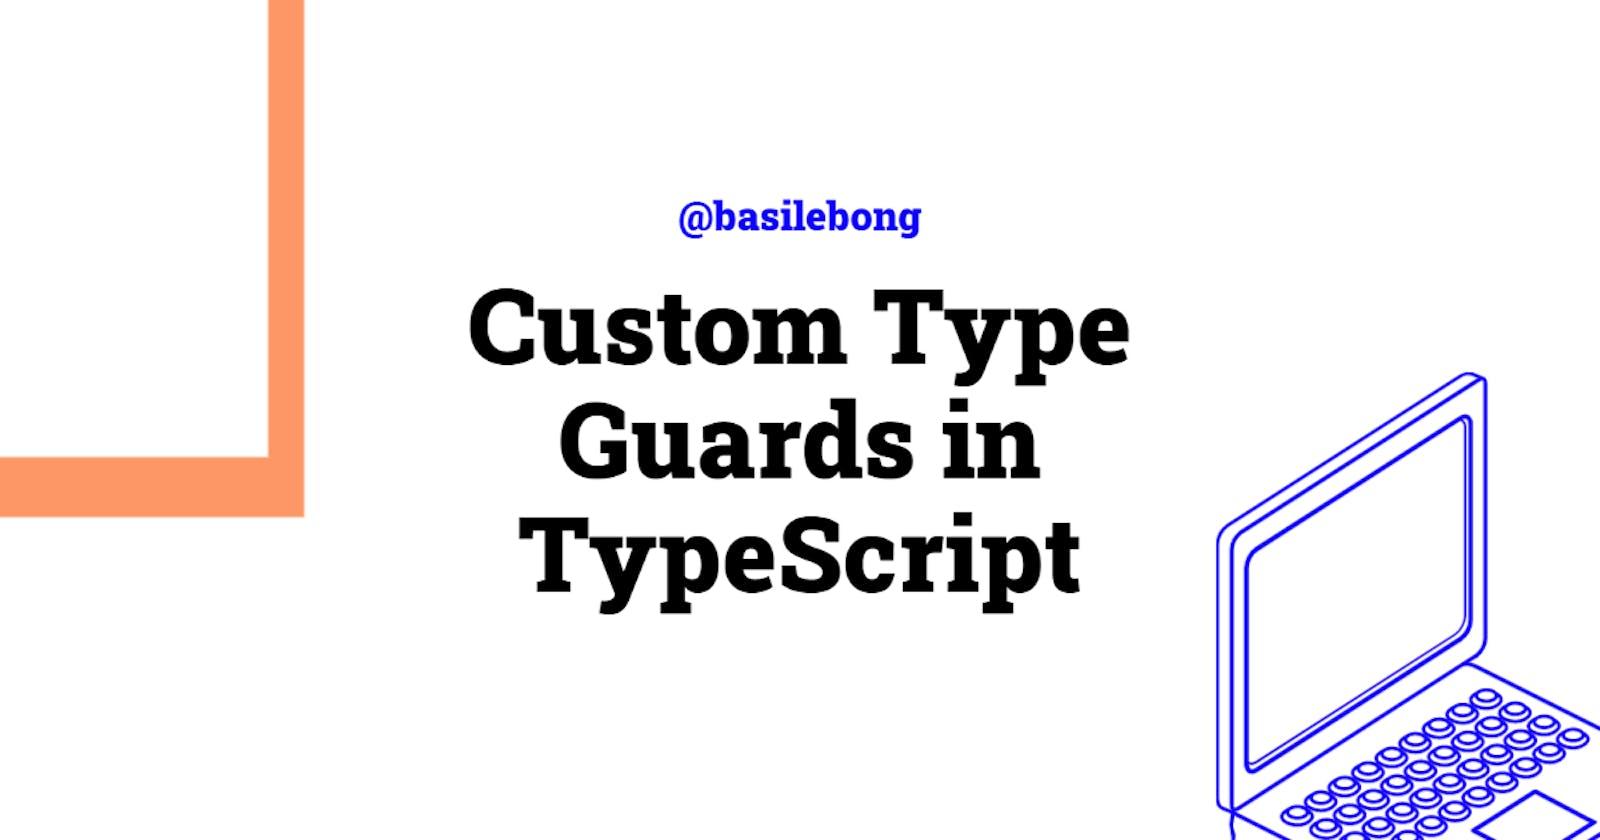 Custom Type Guards in TypeScript